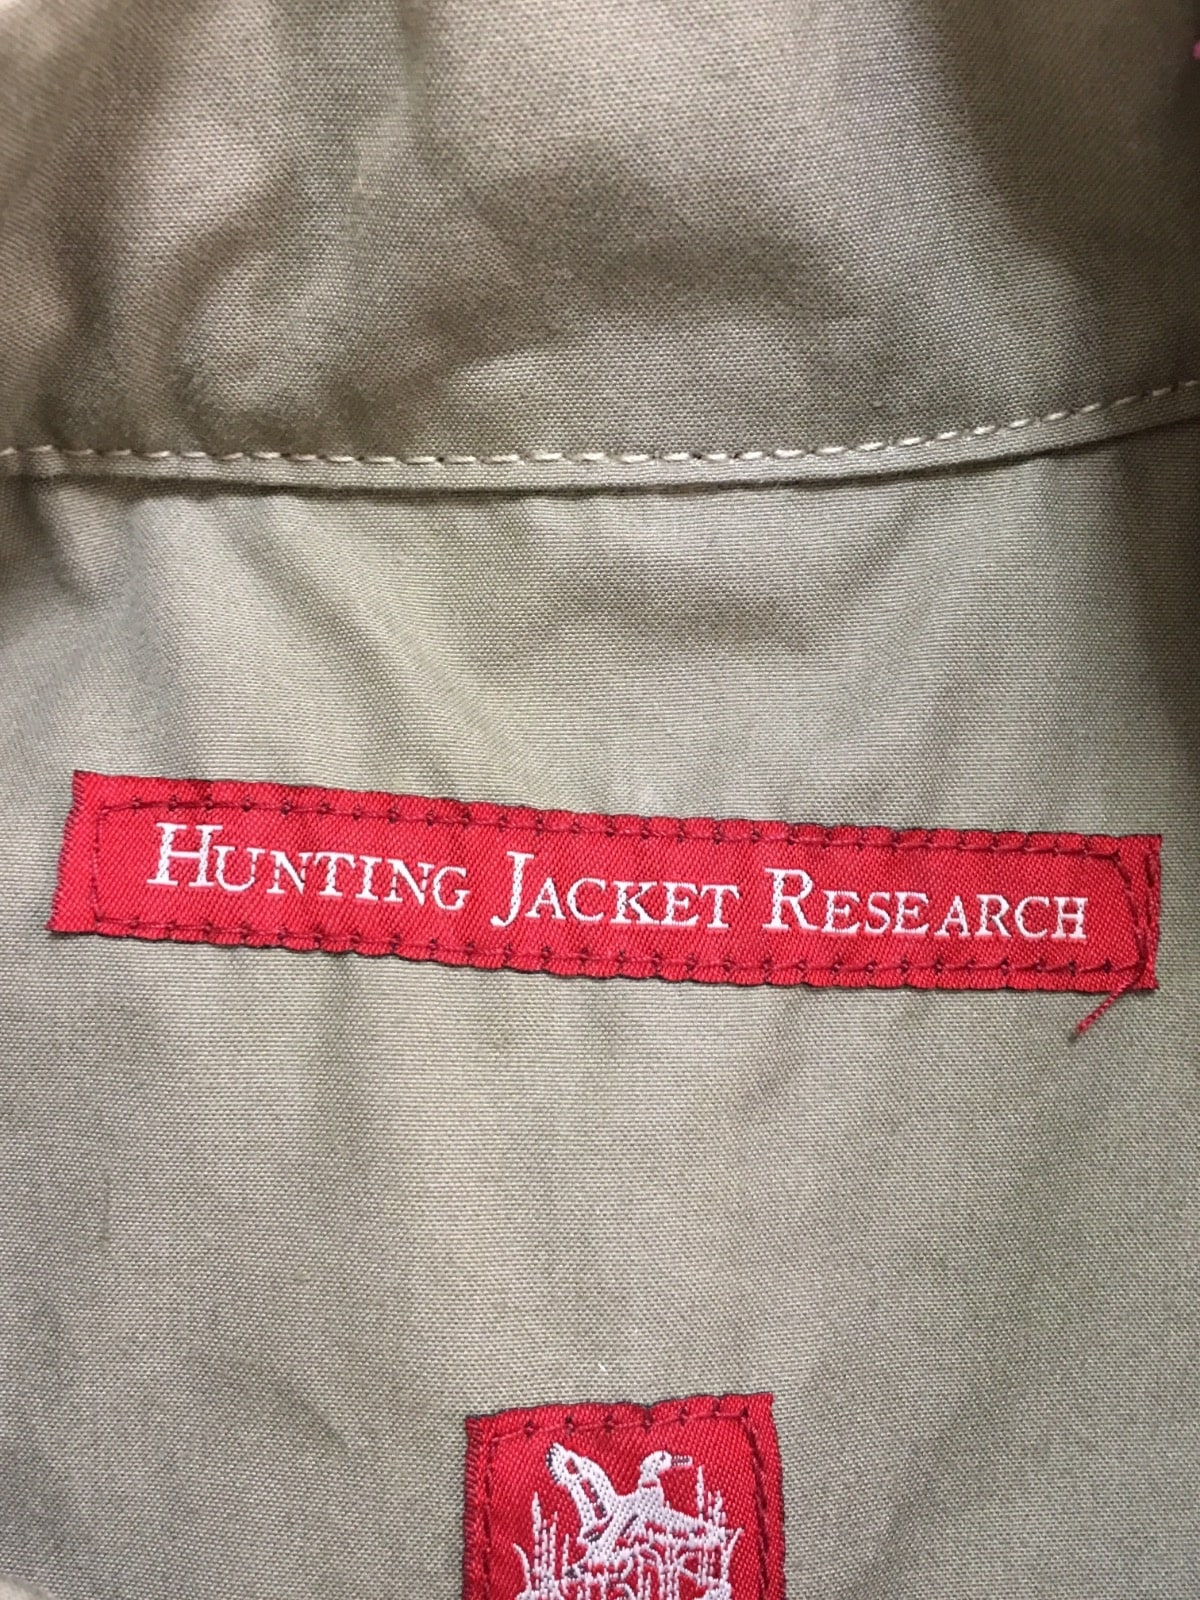 HUNTING JACKET RESEARCH(ハンティングジャケットリサーチ)のコート